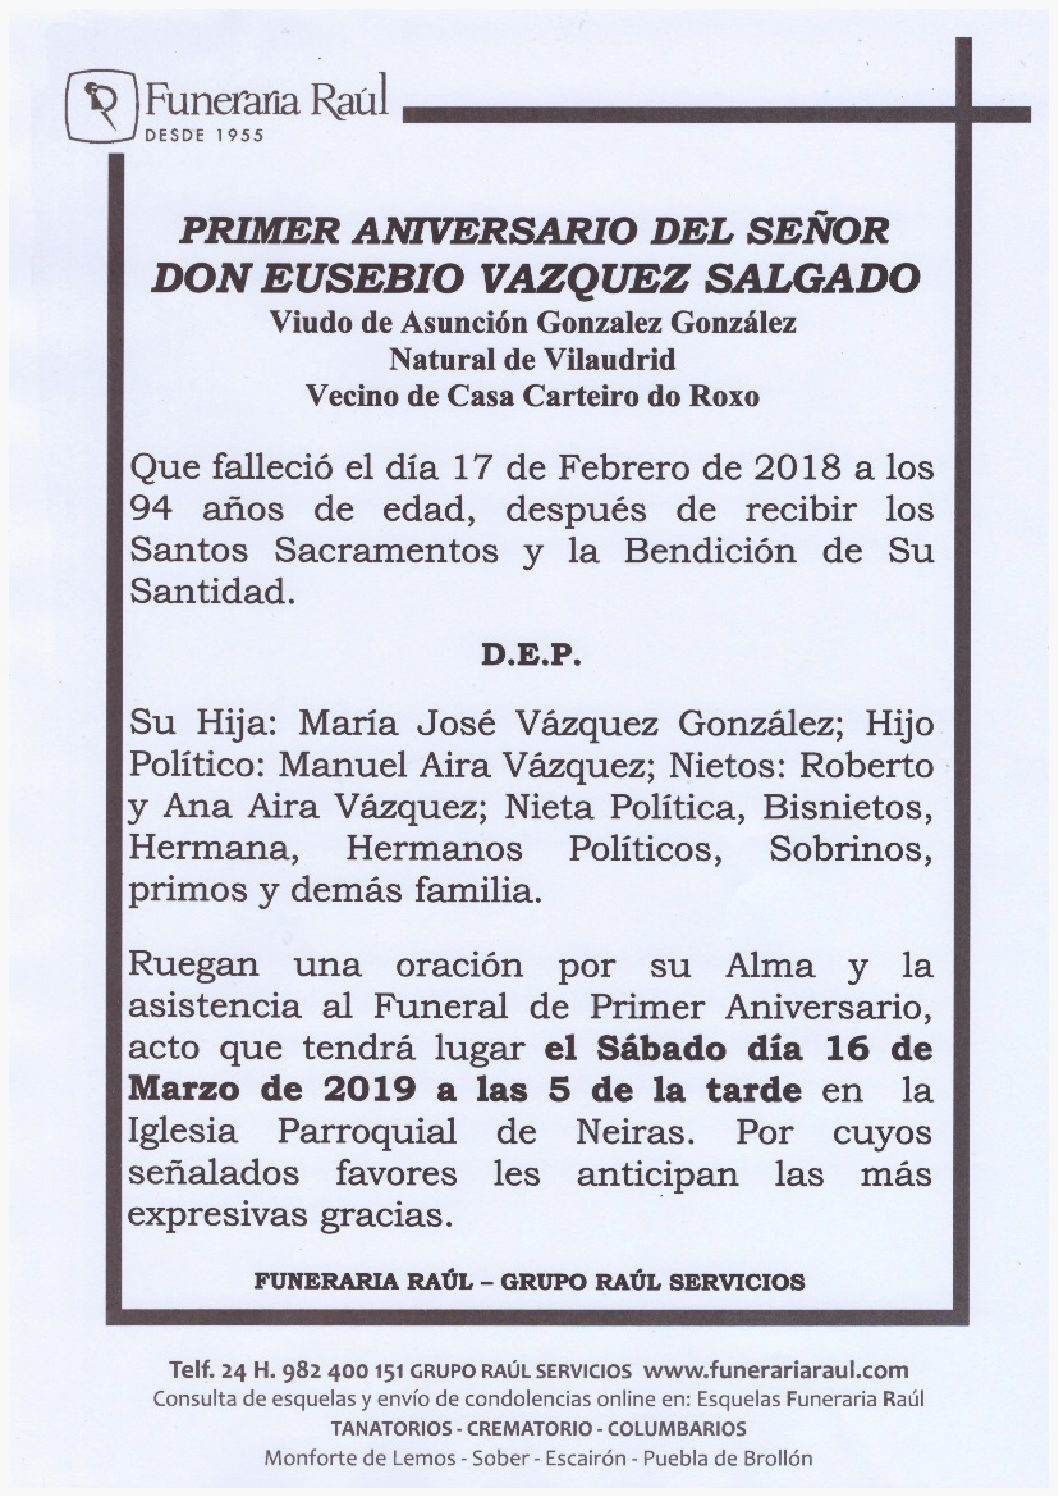 PRIMER ANIVERSARIO DE DON EUSEBIO VAZQUEZ SALGADO